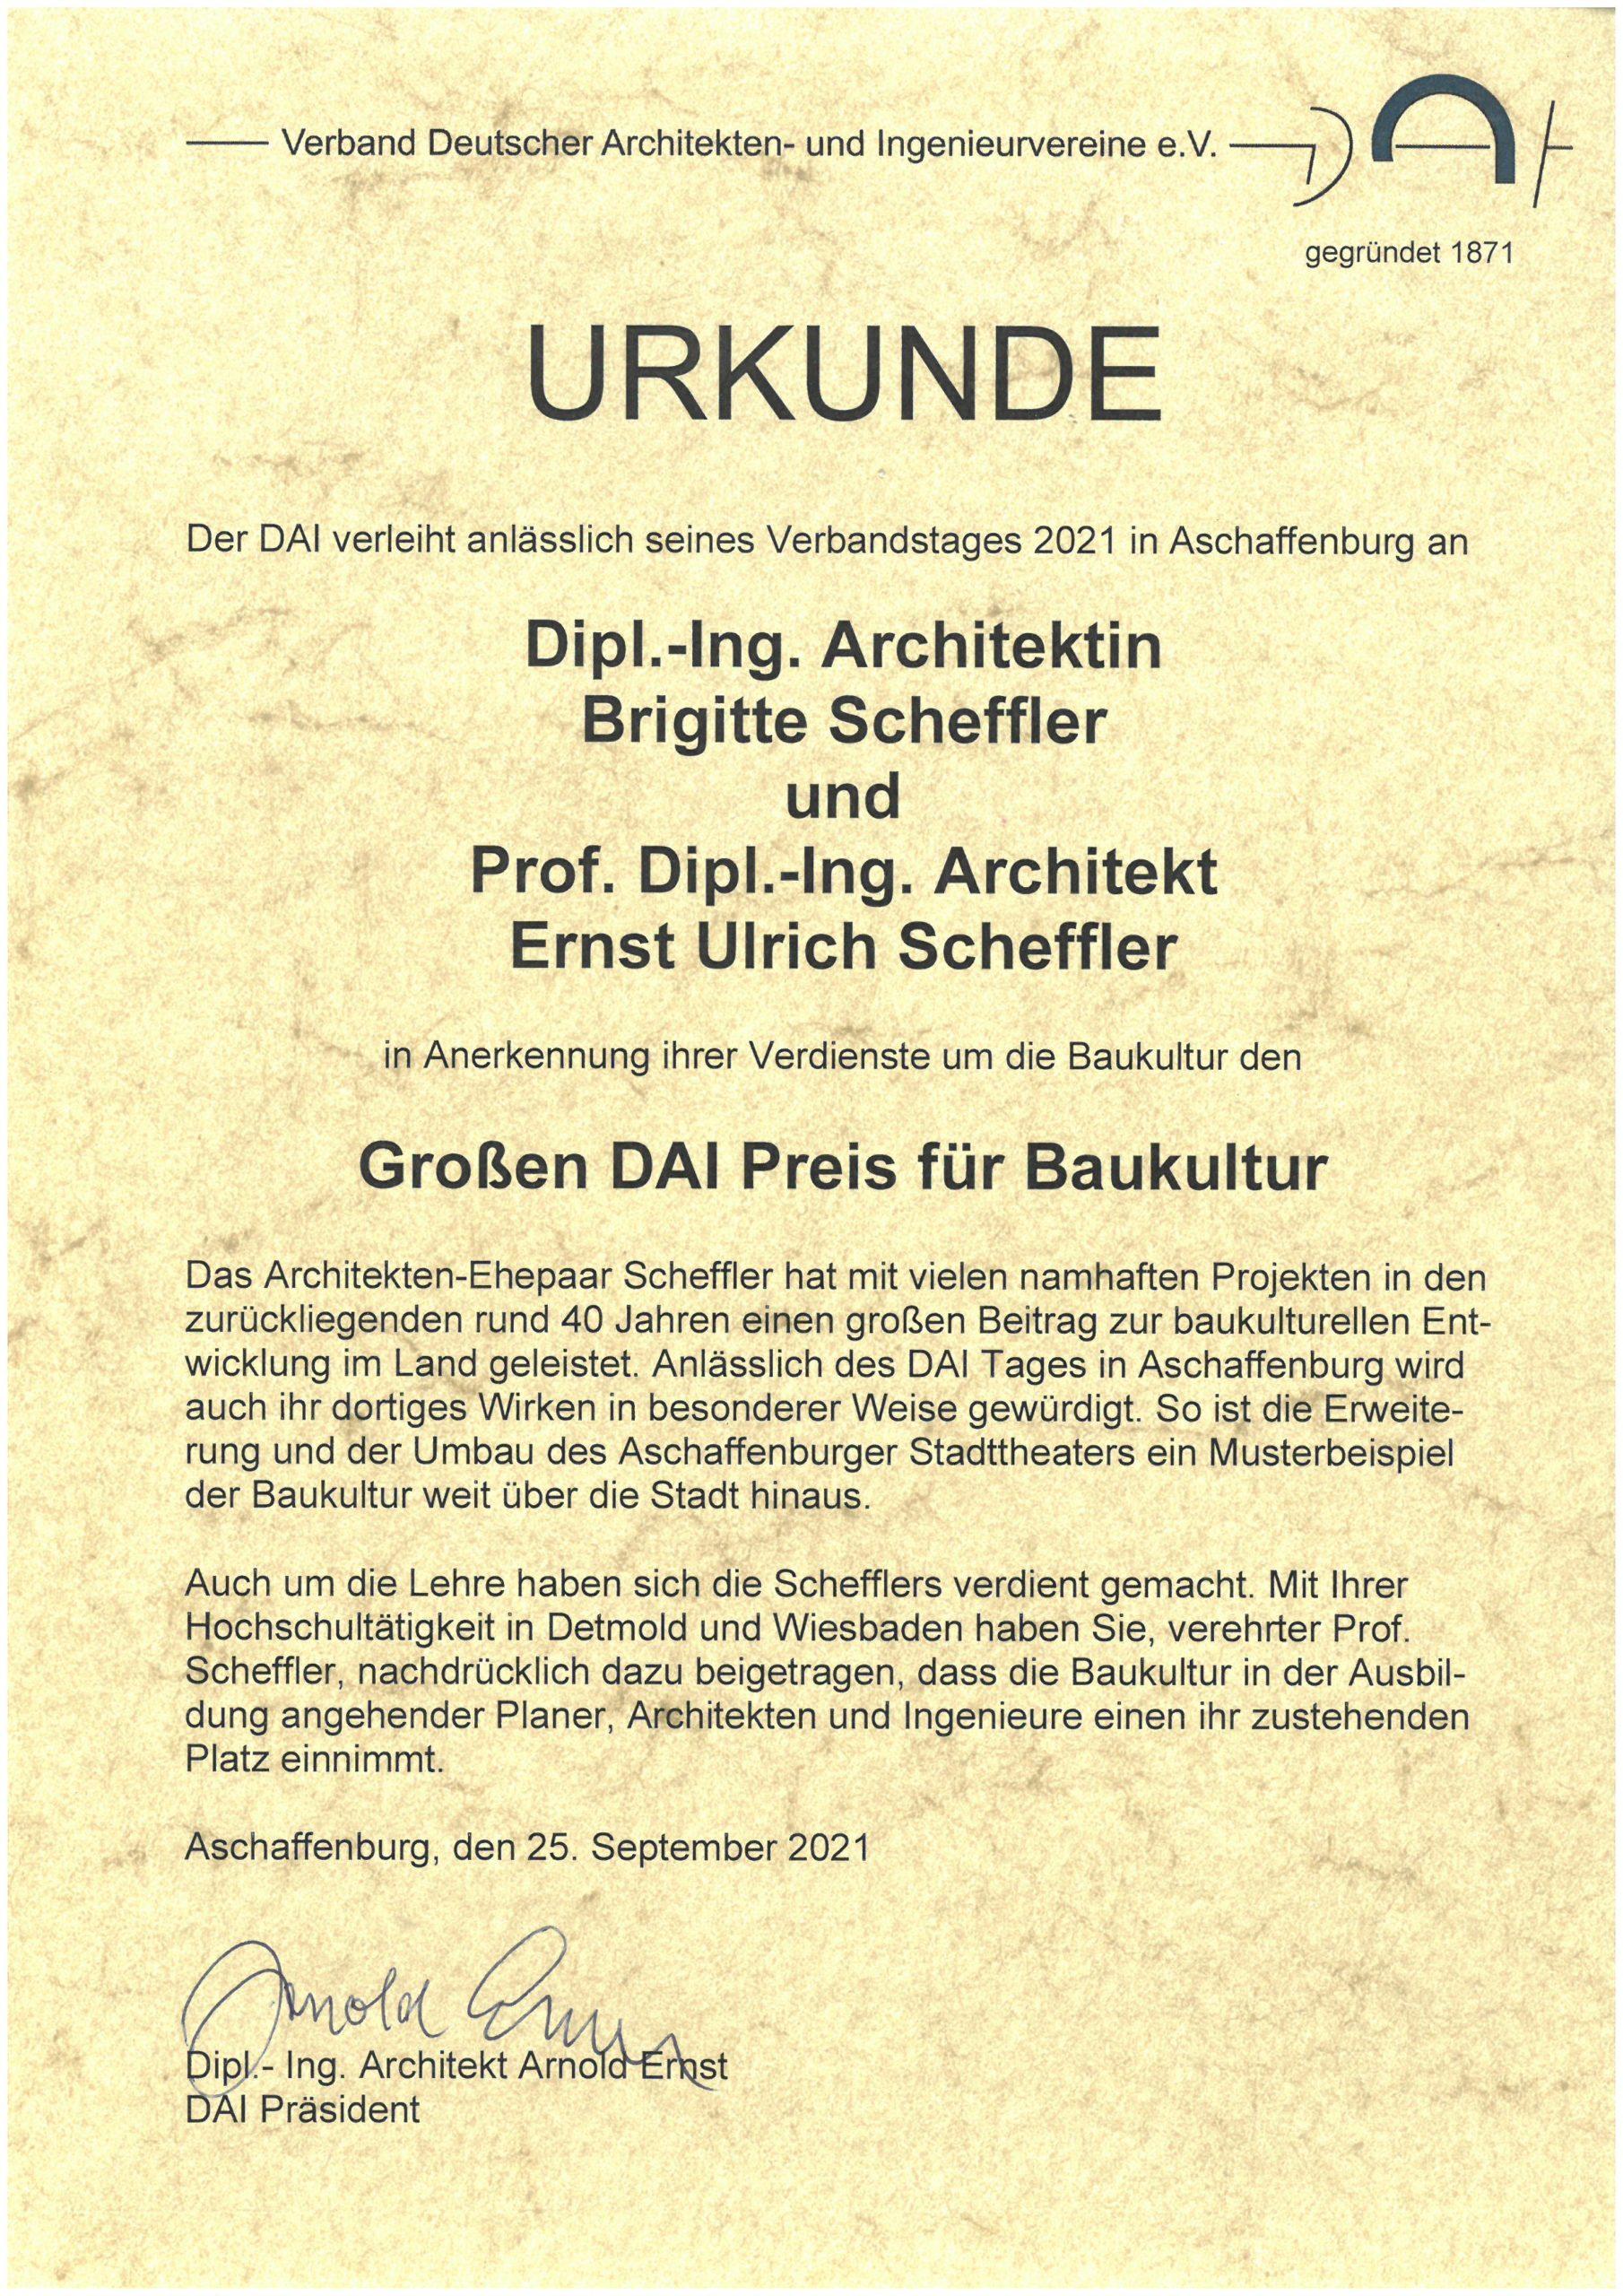 Urkunde DAI Preis